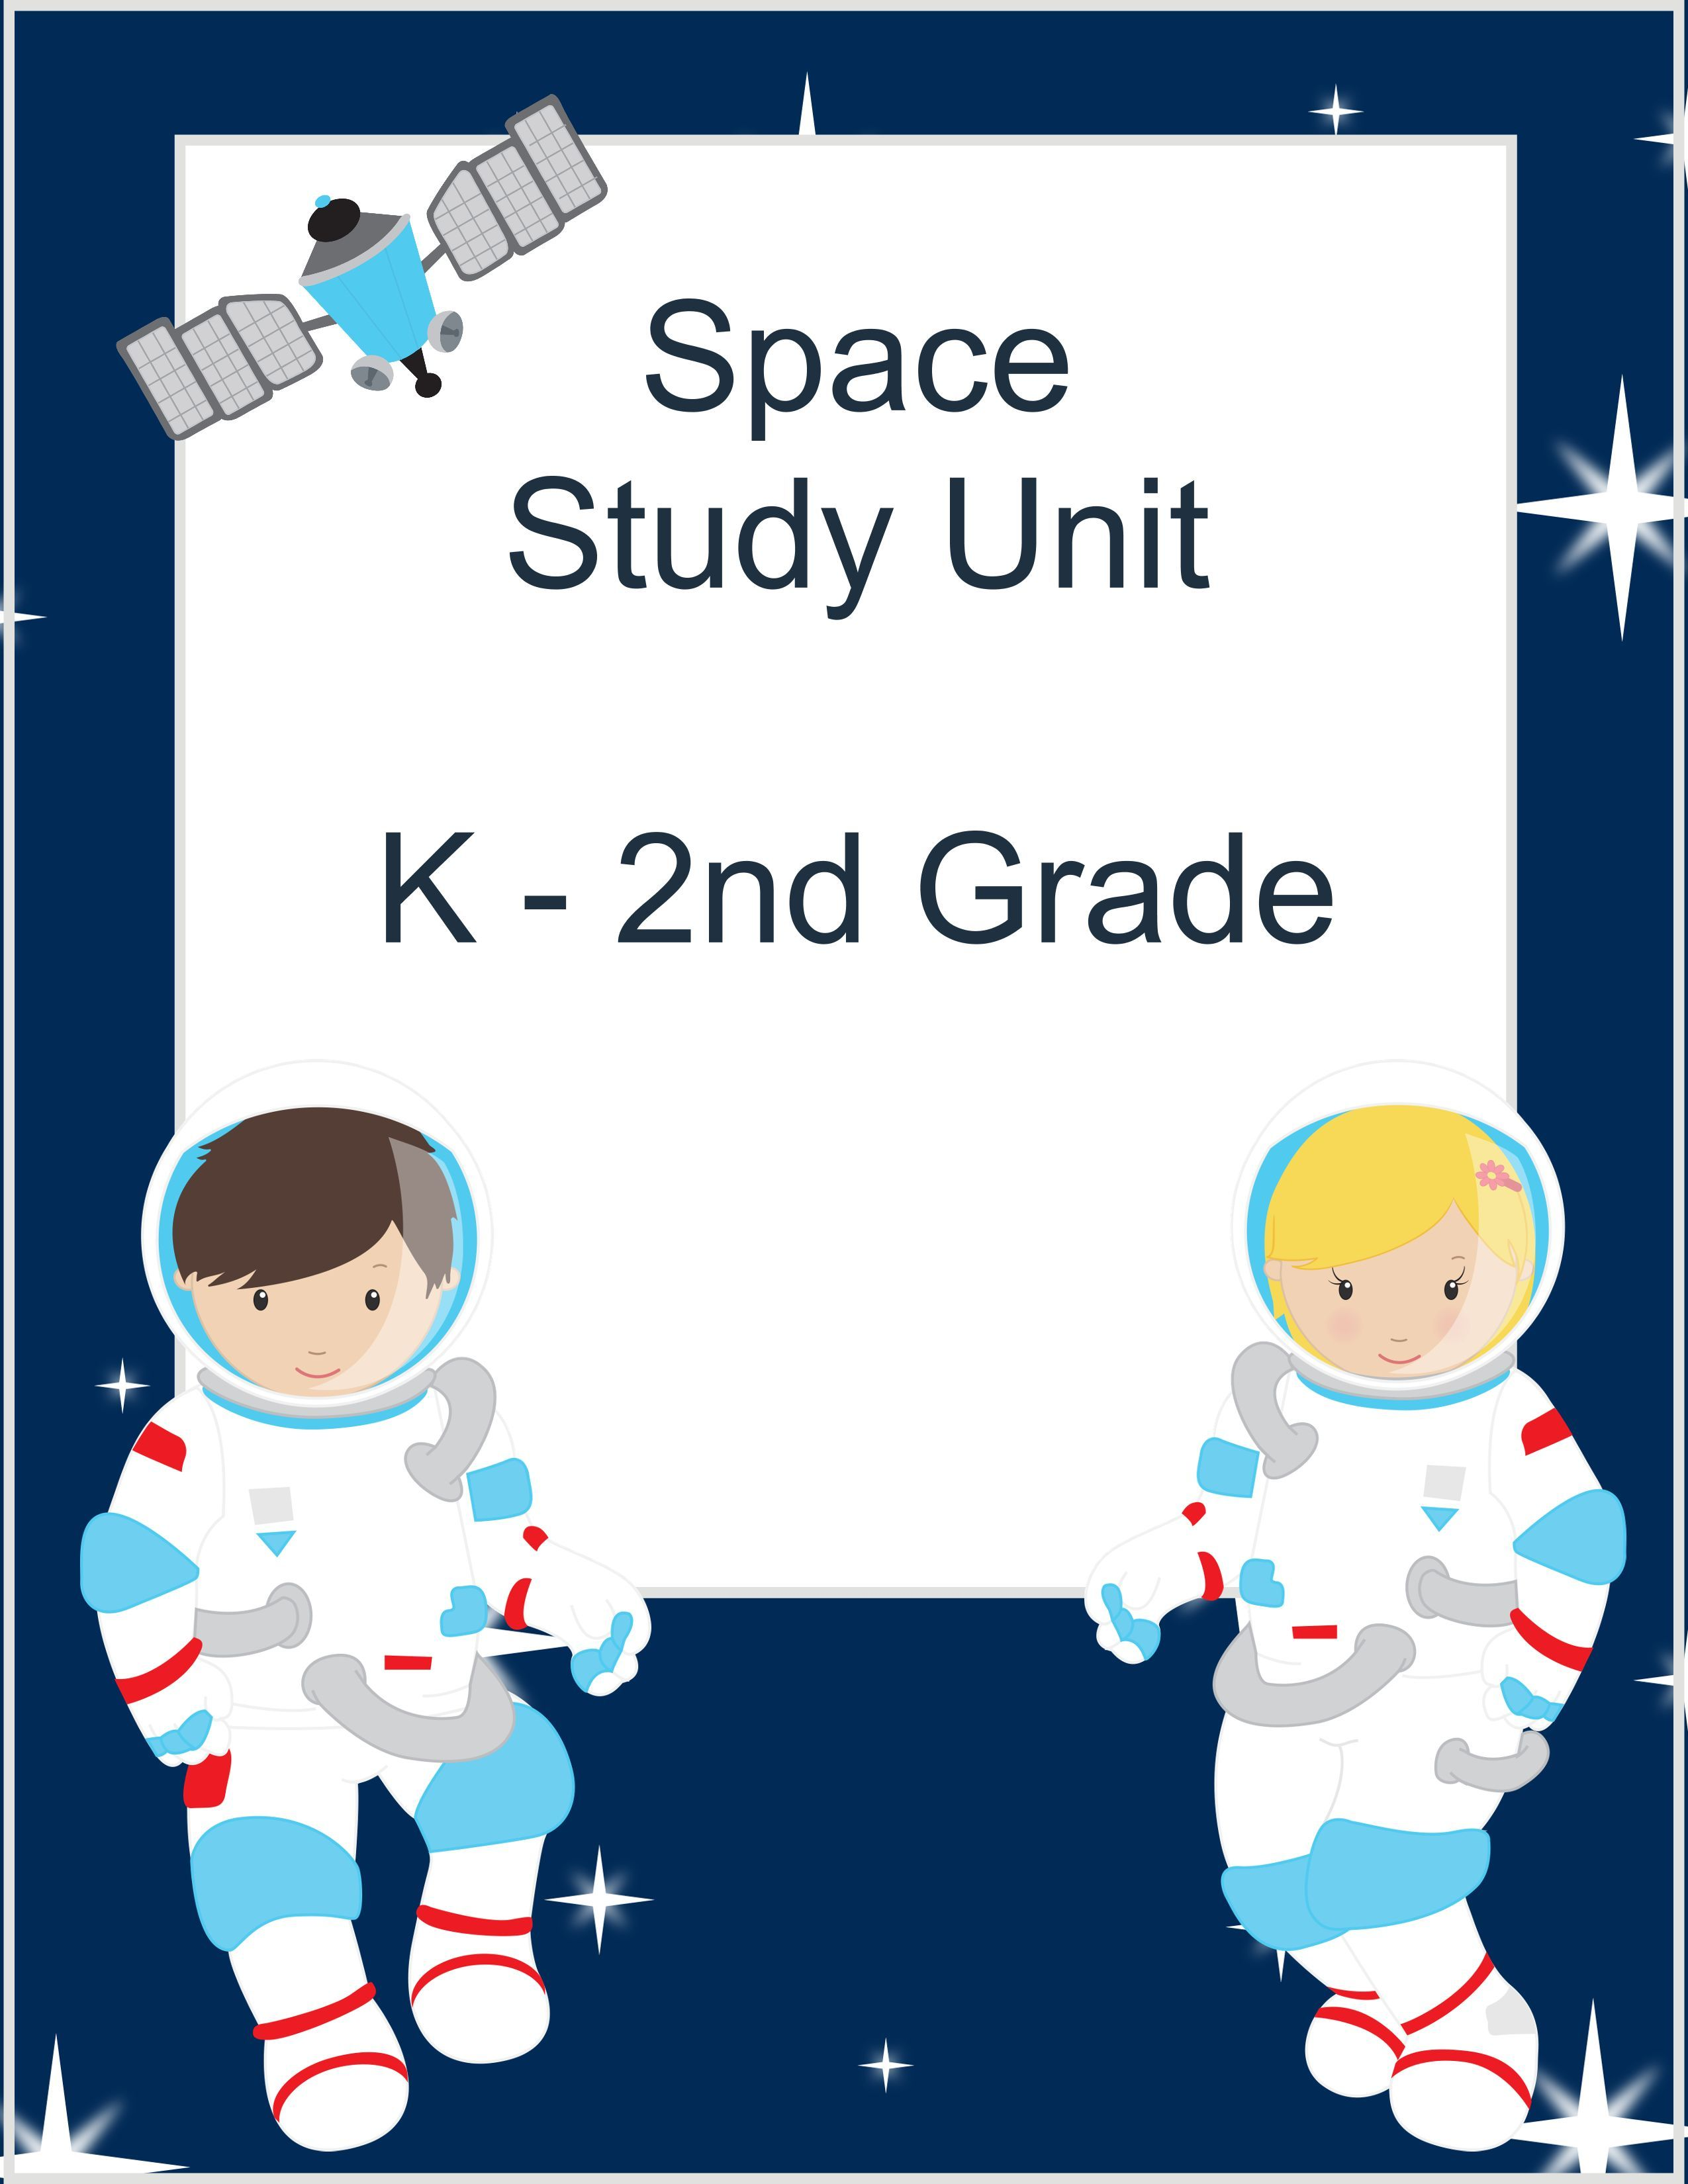 Space Study Unit Ideas - The Relaxed Homeschool   Kindergarten units [ 3300 x 2550 Pixel ]